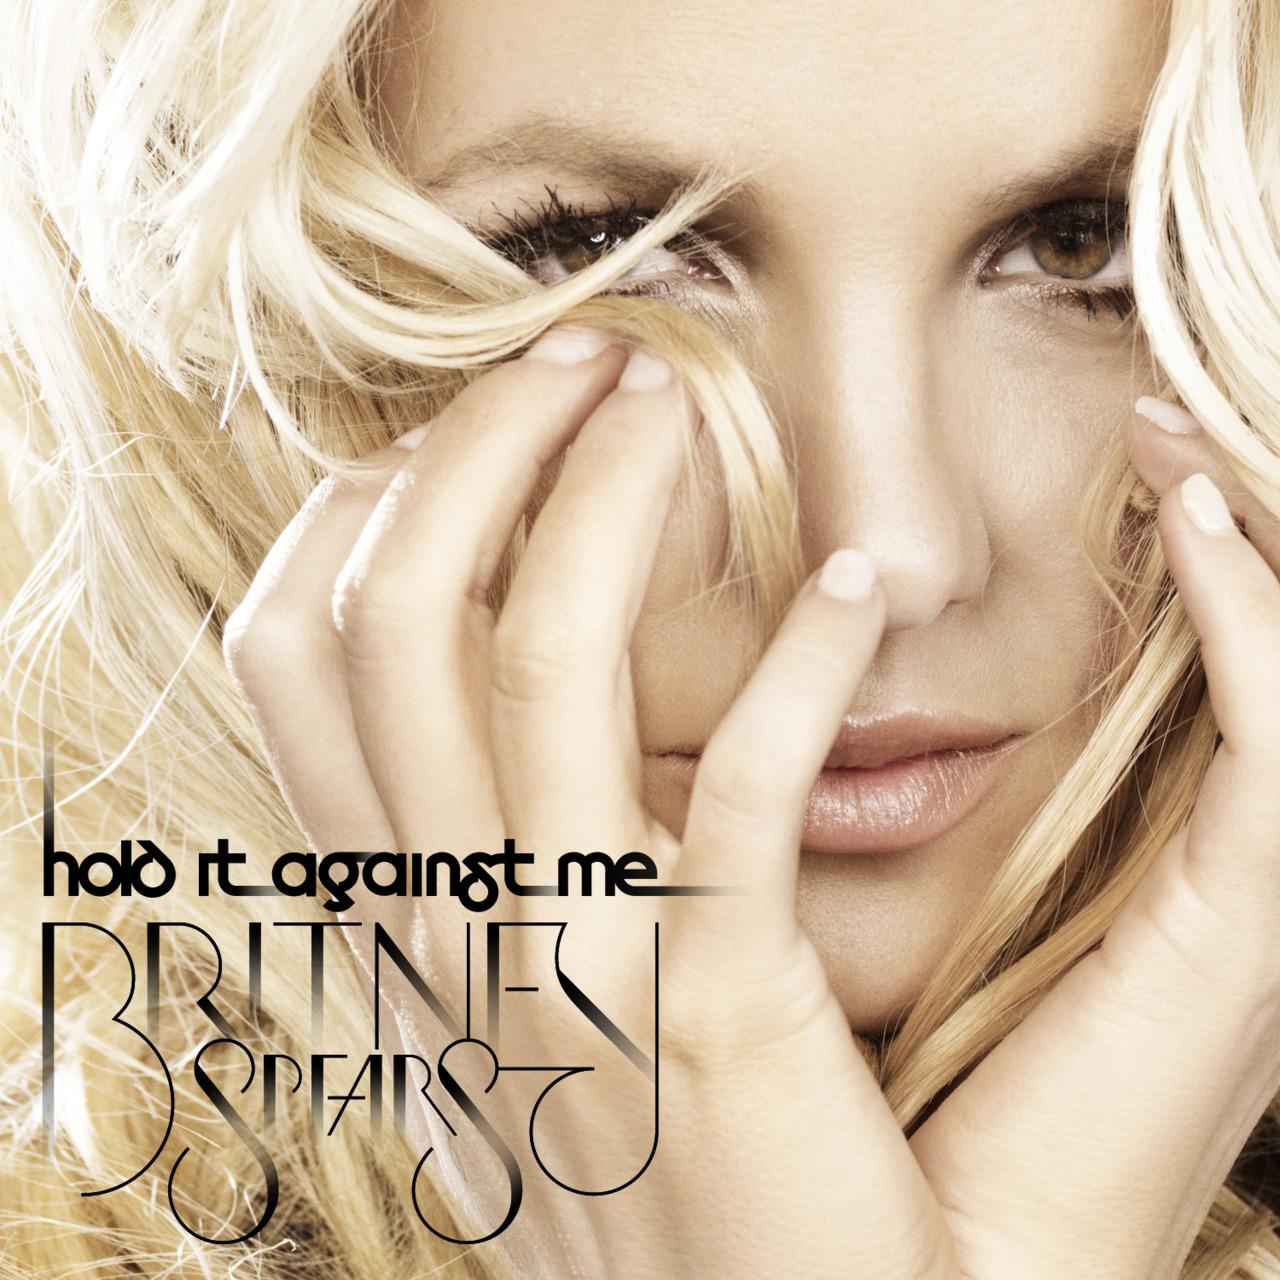 http://4.bp.blogspot.com/_KlOa00uQaMw/TSsGawUVAfI/AAAAAAAAAIw/DXCs5-UZjB8/s1600/britney-hold-it-against-me.jpg